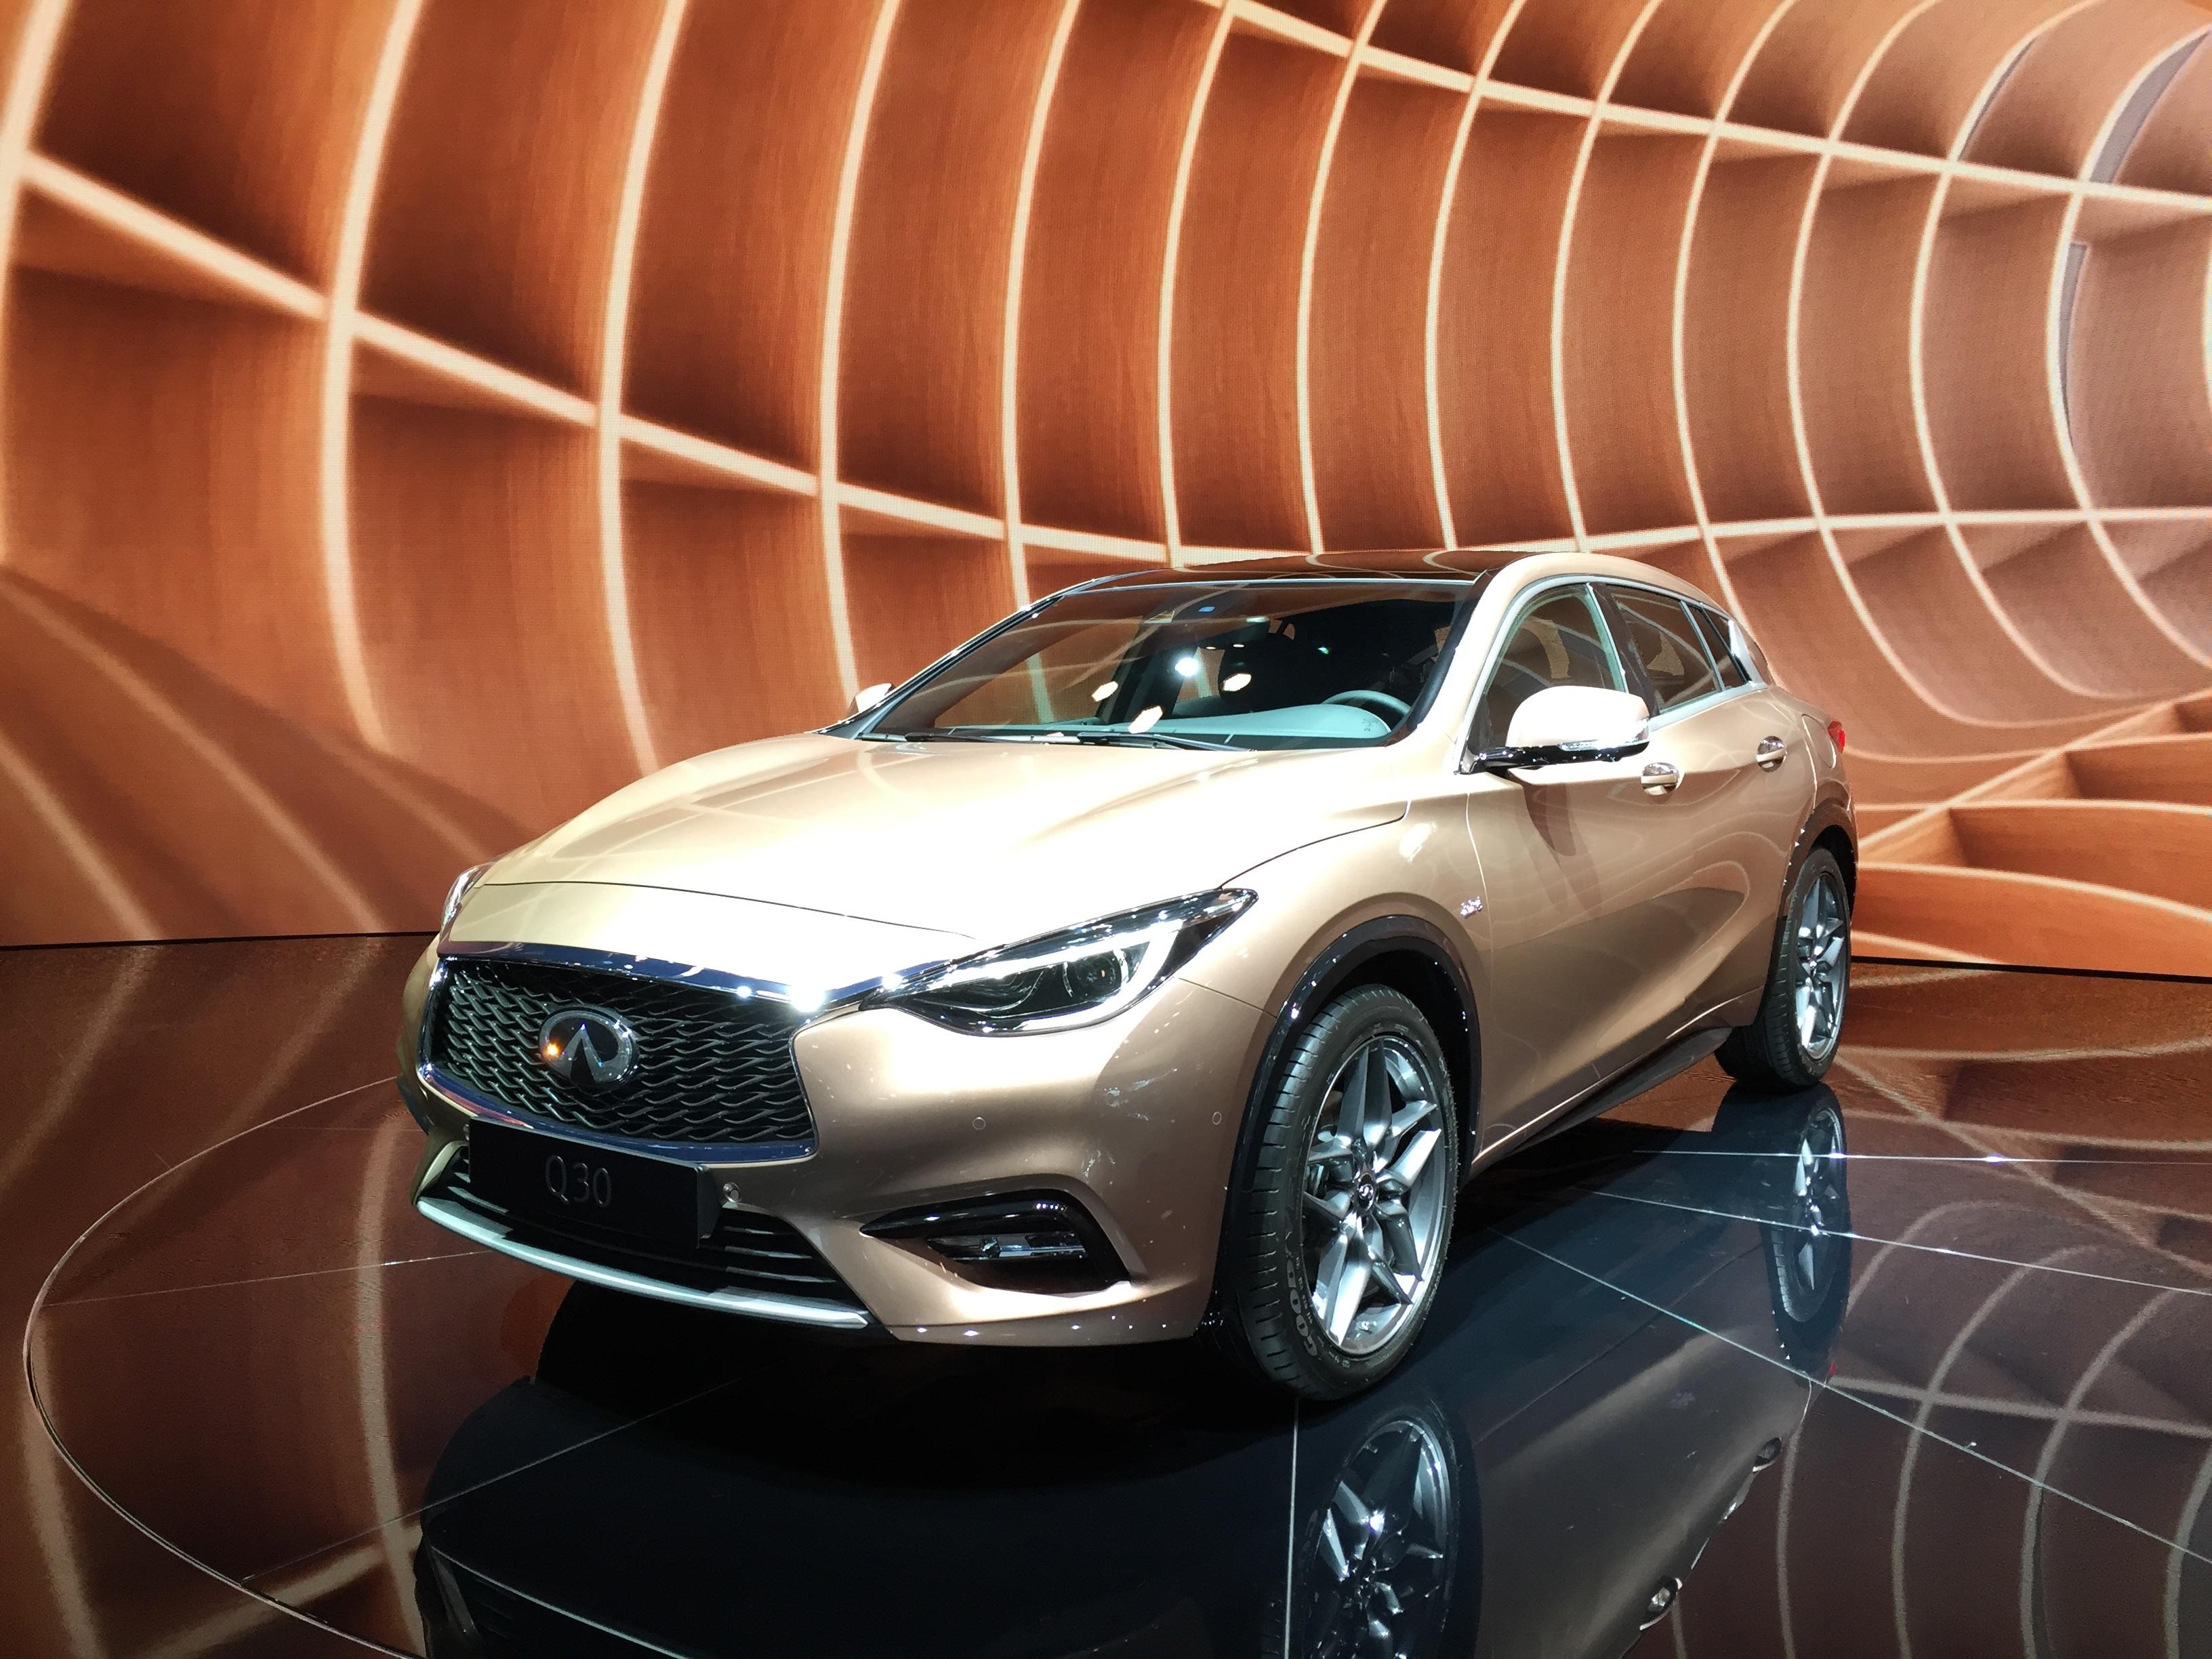 Free Images : Infinity, Japan, Cobweb, Gold, Sedan, Dynamic, Mercedes,  Exhibition, Frankfurt, Iaa, Nissan, Premium, A Class, Auto Show, Sport  Utility ...